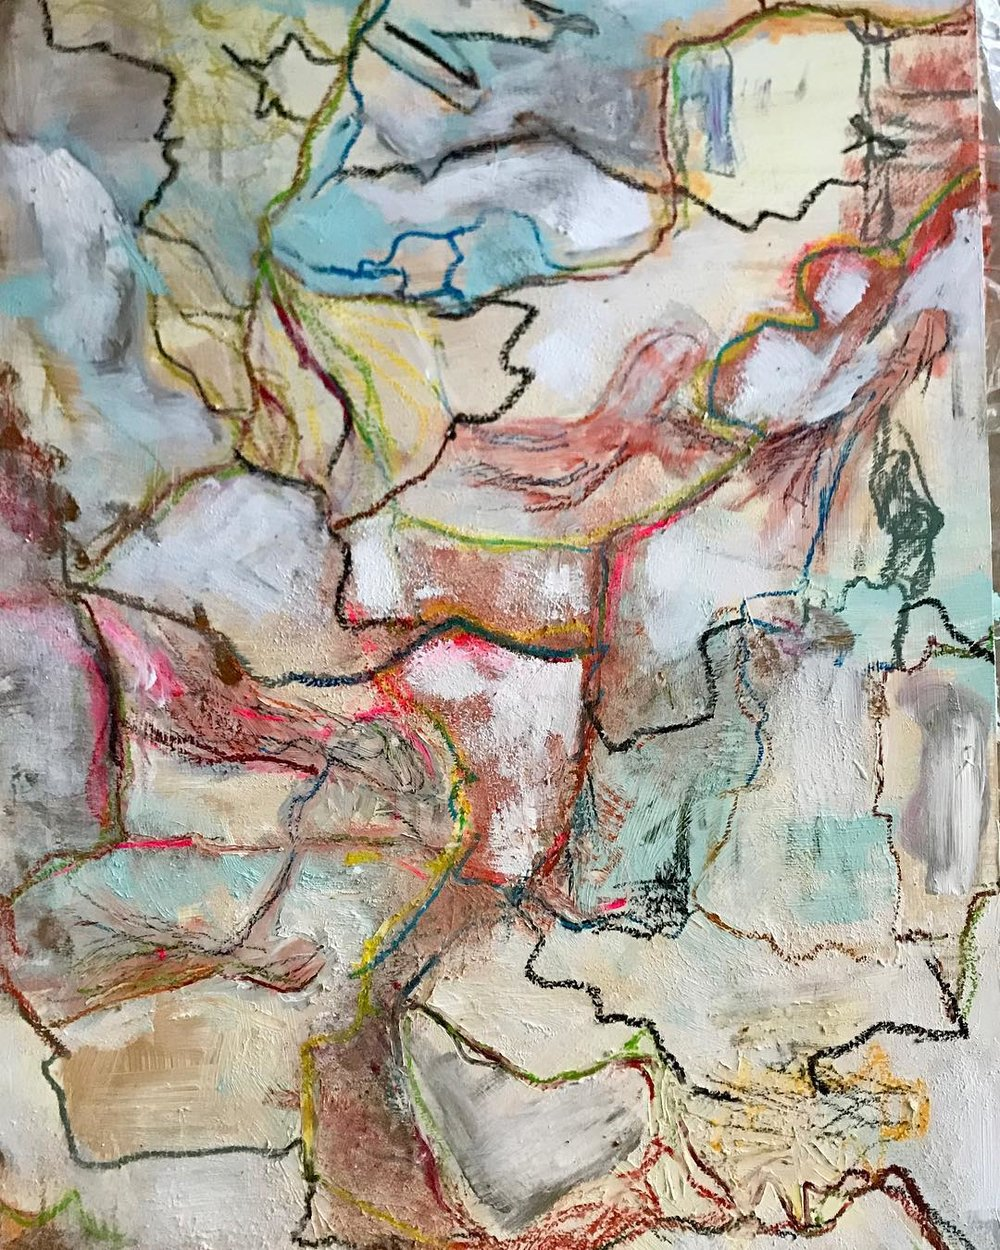 Brigid McGivern, 2018, _Childhood Cracks_, acrylic and pastel on panel, 24x36. $3500jpg.jpg